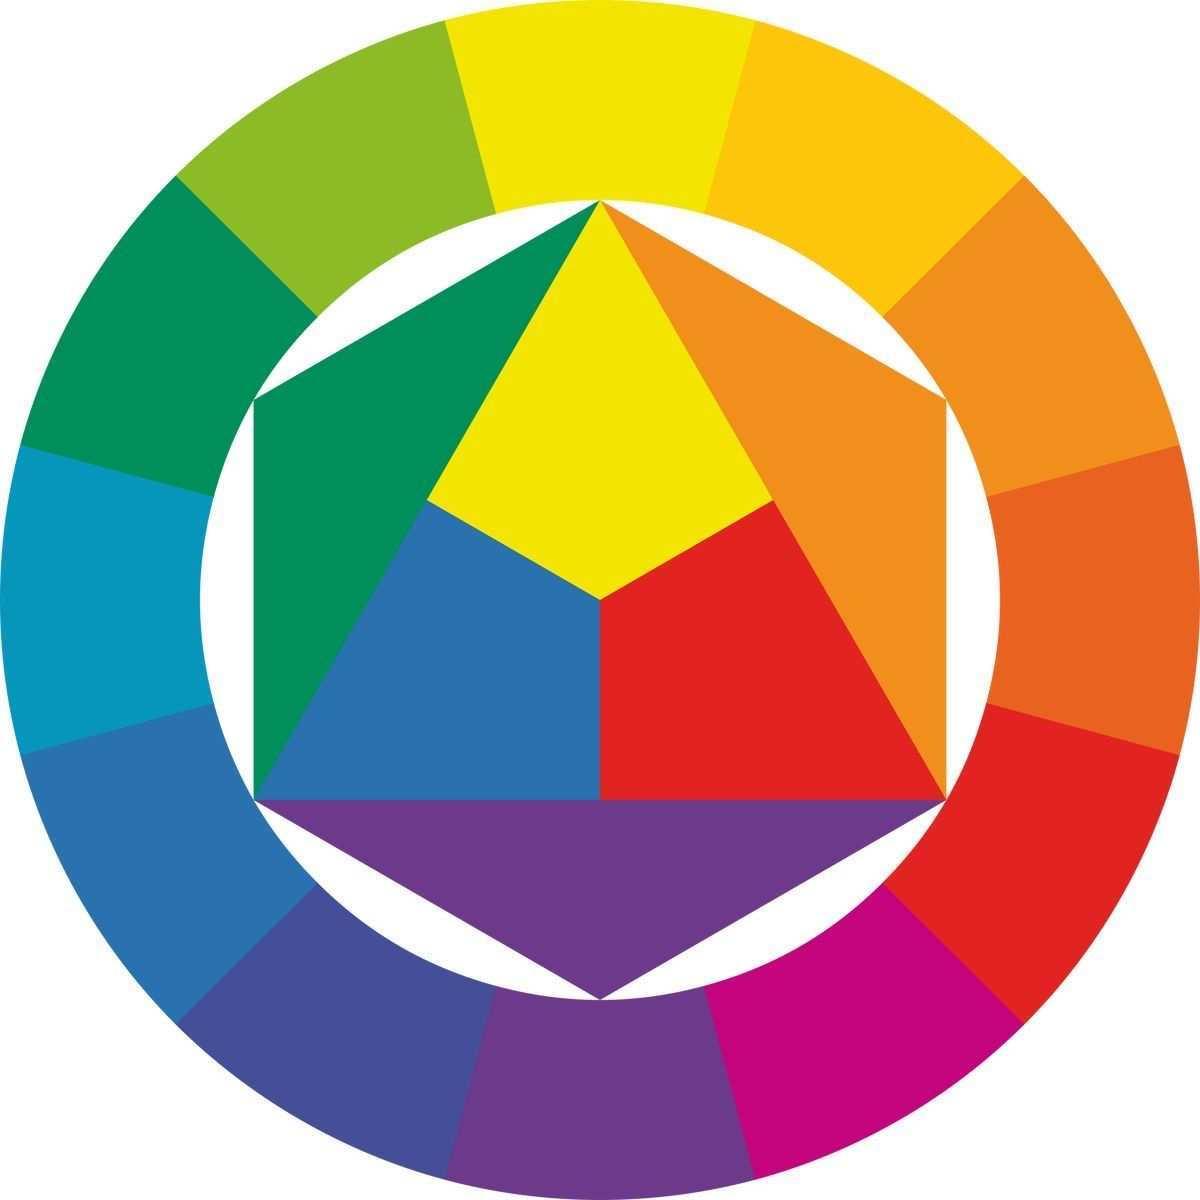 Johannes Itten 1887 1967 In 2020 Color Wheel Art Colour Wheel Theory Bauhaus Colors